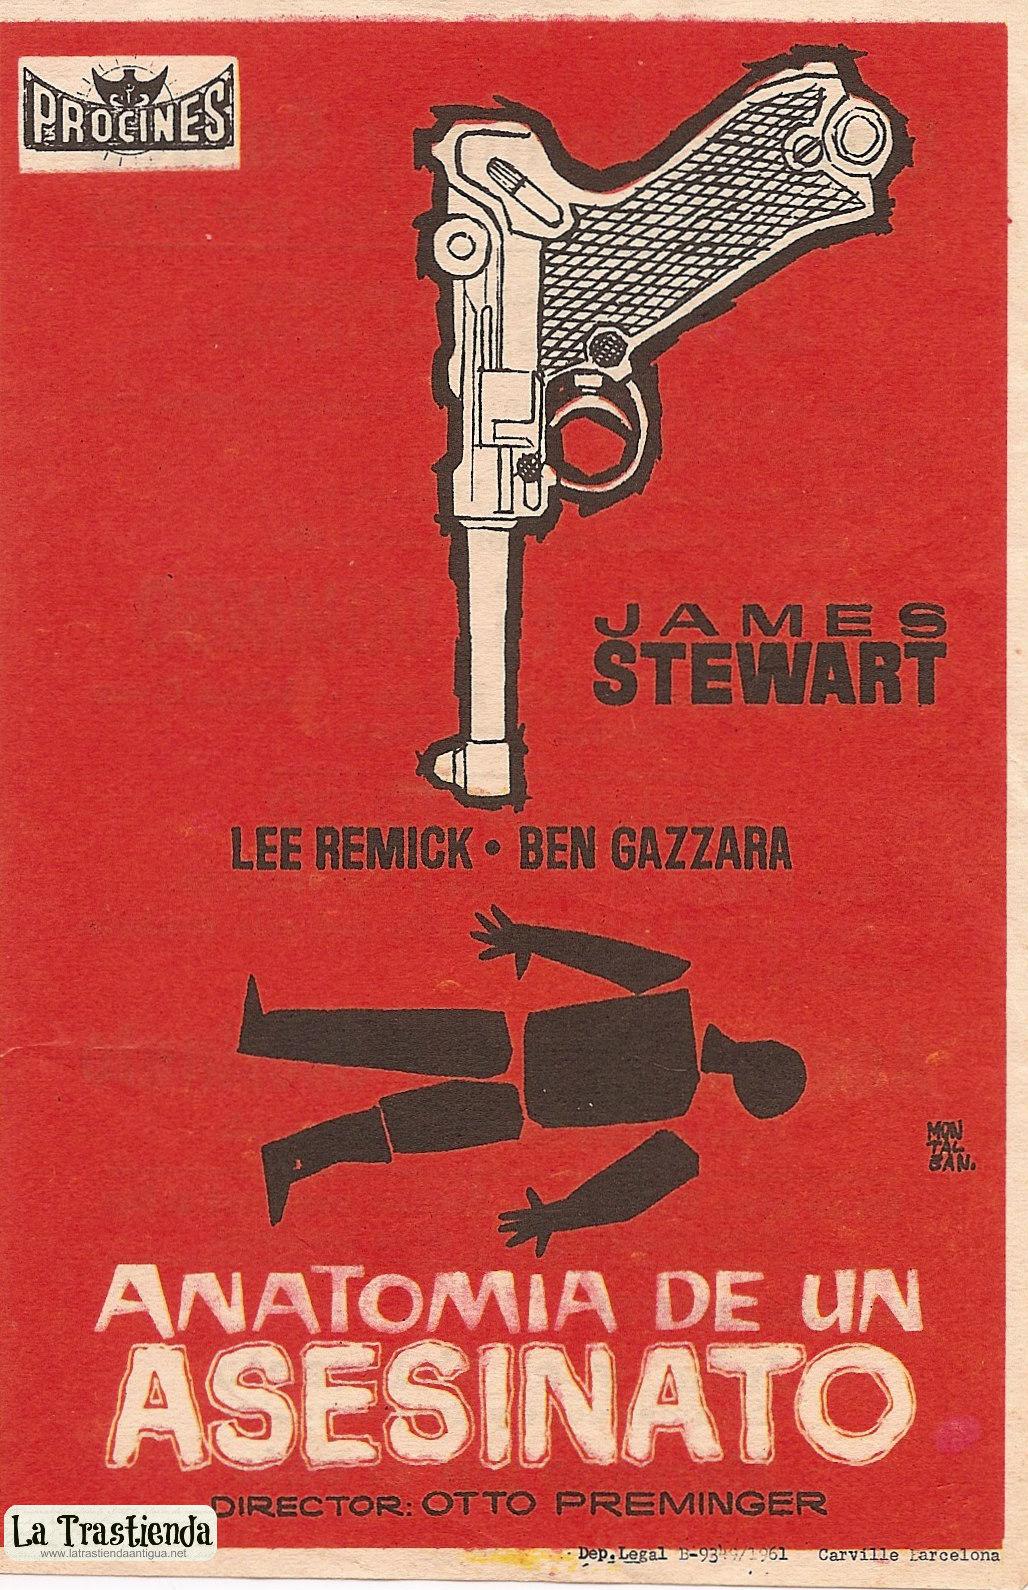 Anatoma de un asesinato Movie posters Carteles de cine